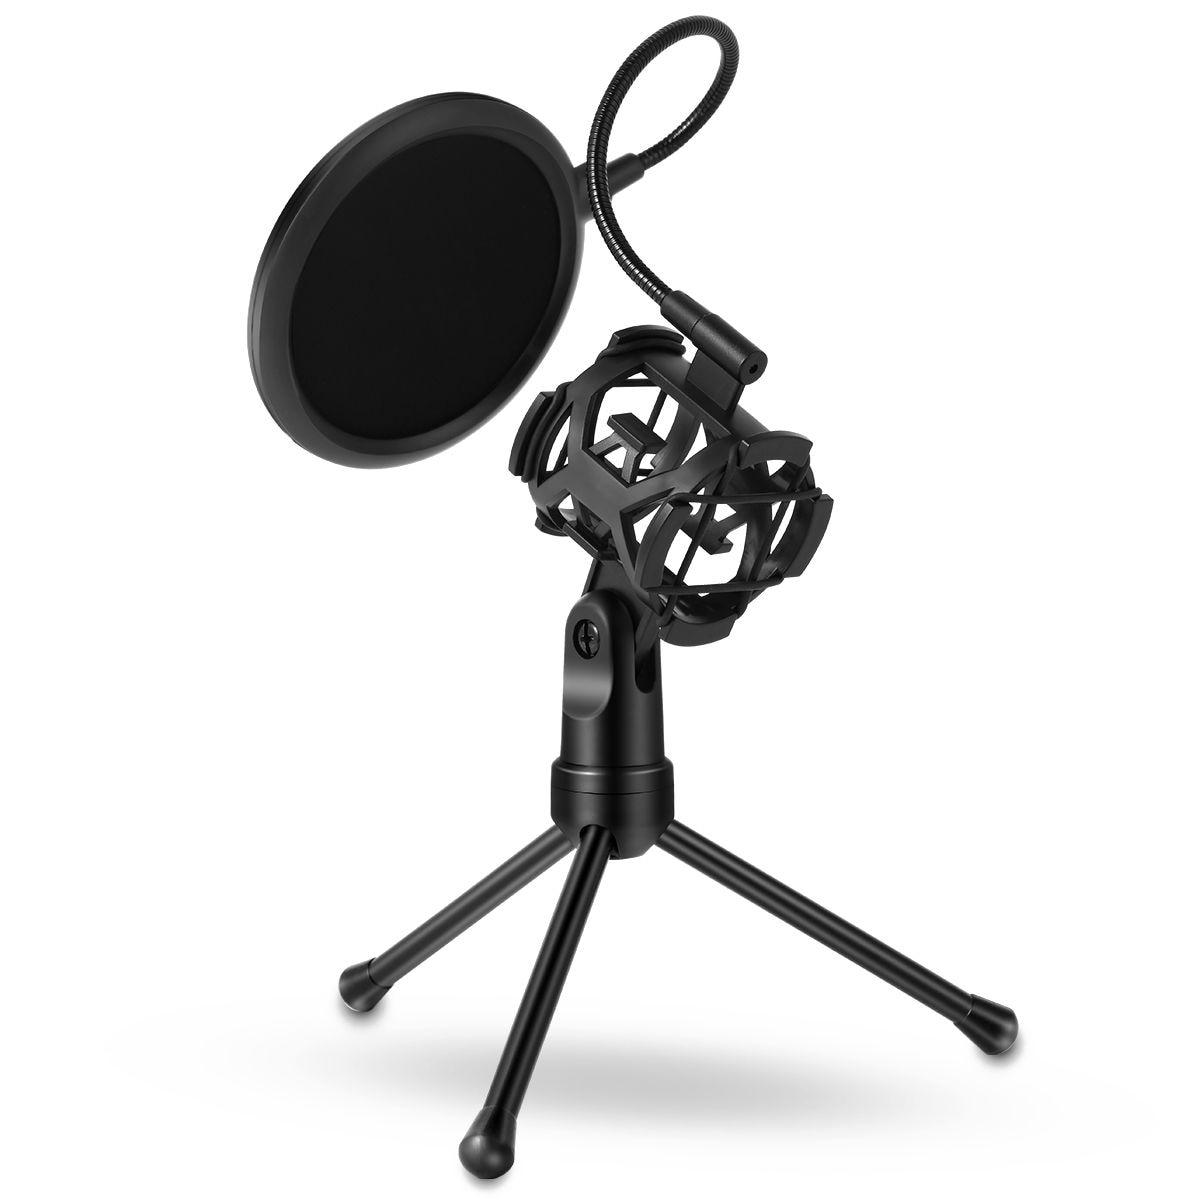 Mikrofonstativ AnpassungsfäHig Scls Neue Mini Mikrofon Pop Filter Stoßfest Desktop Stativ Mikrofon Halterung Filter Abdeckung Für Rundfunk Kar Heimelektronik Zubehör